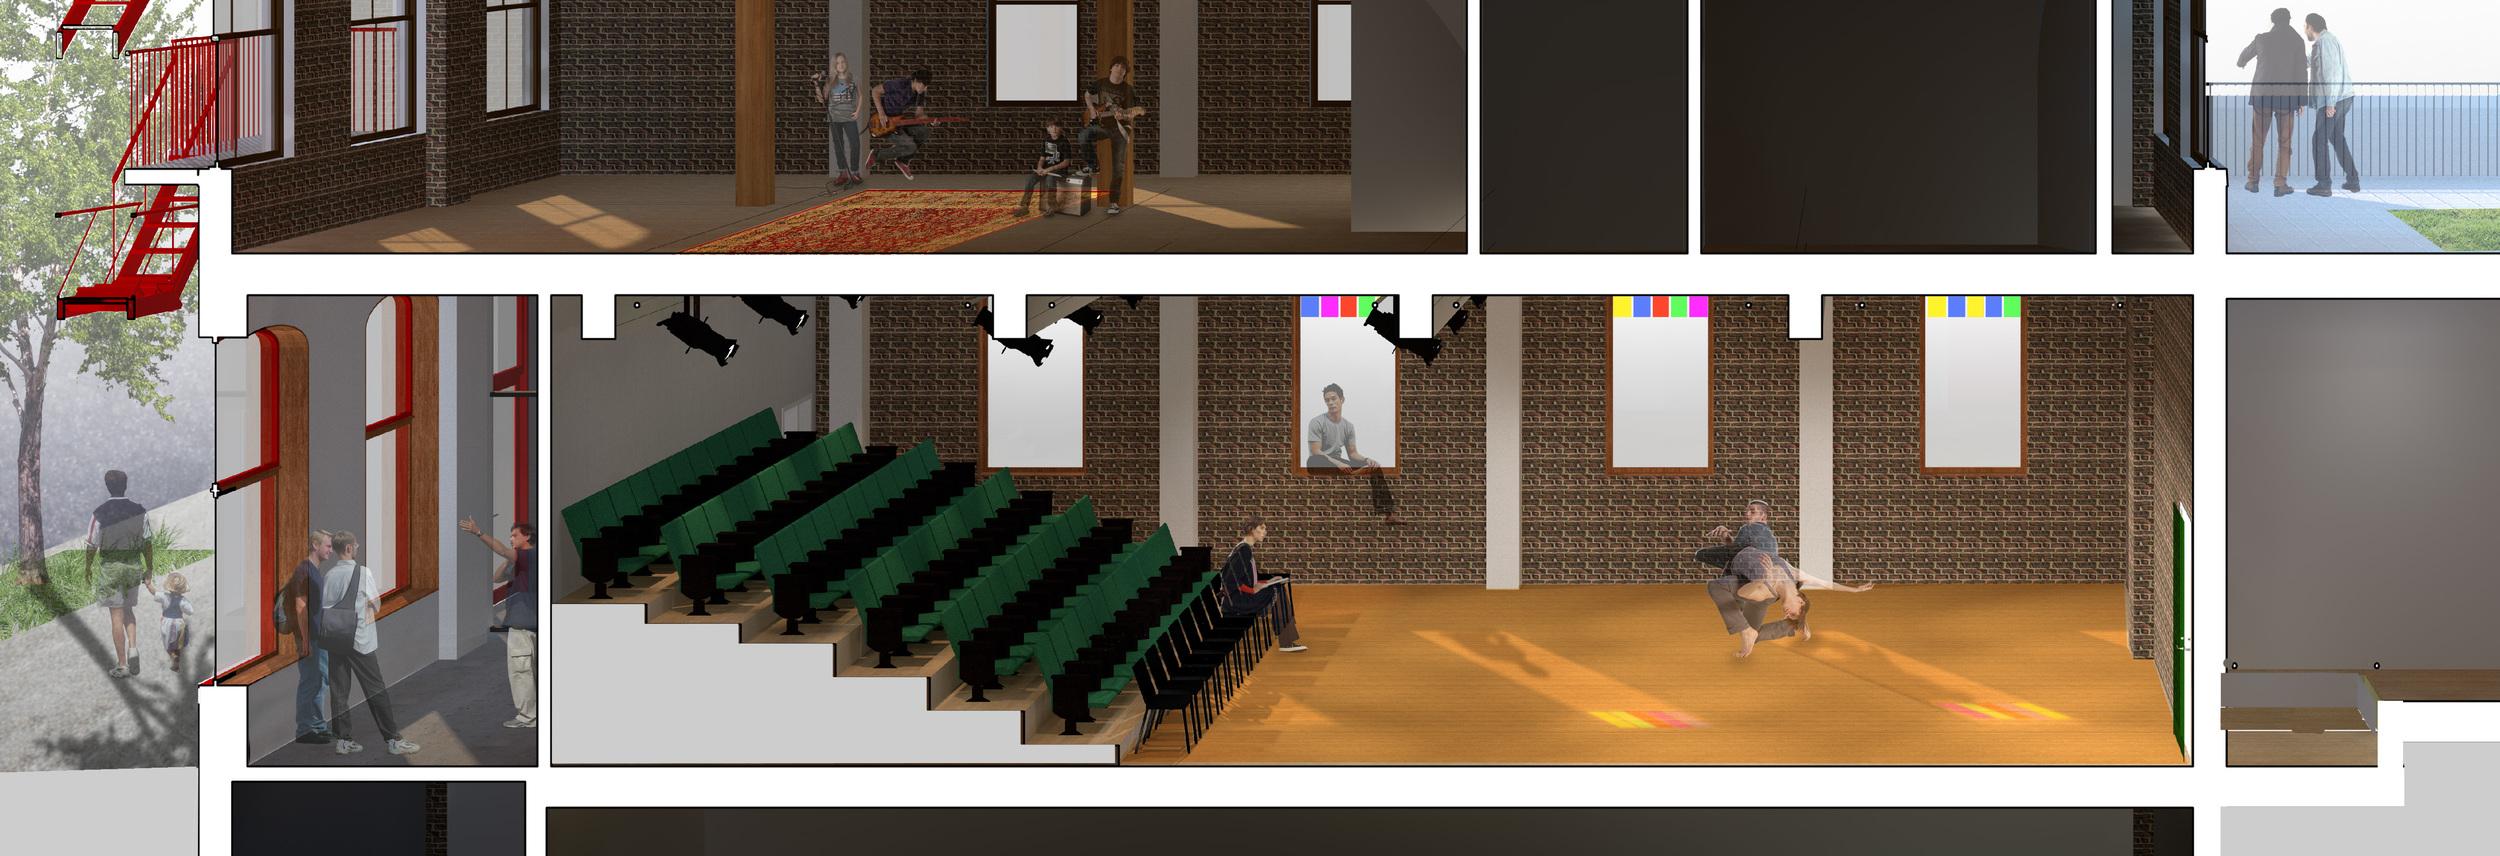 Theater Cutaway_rev3.jpg